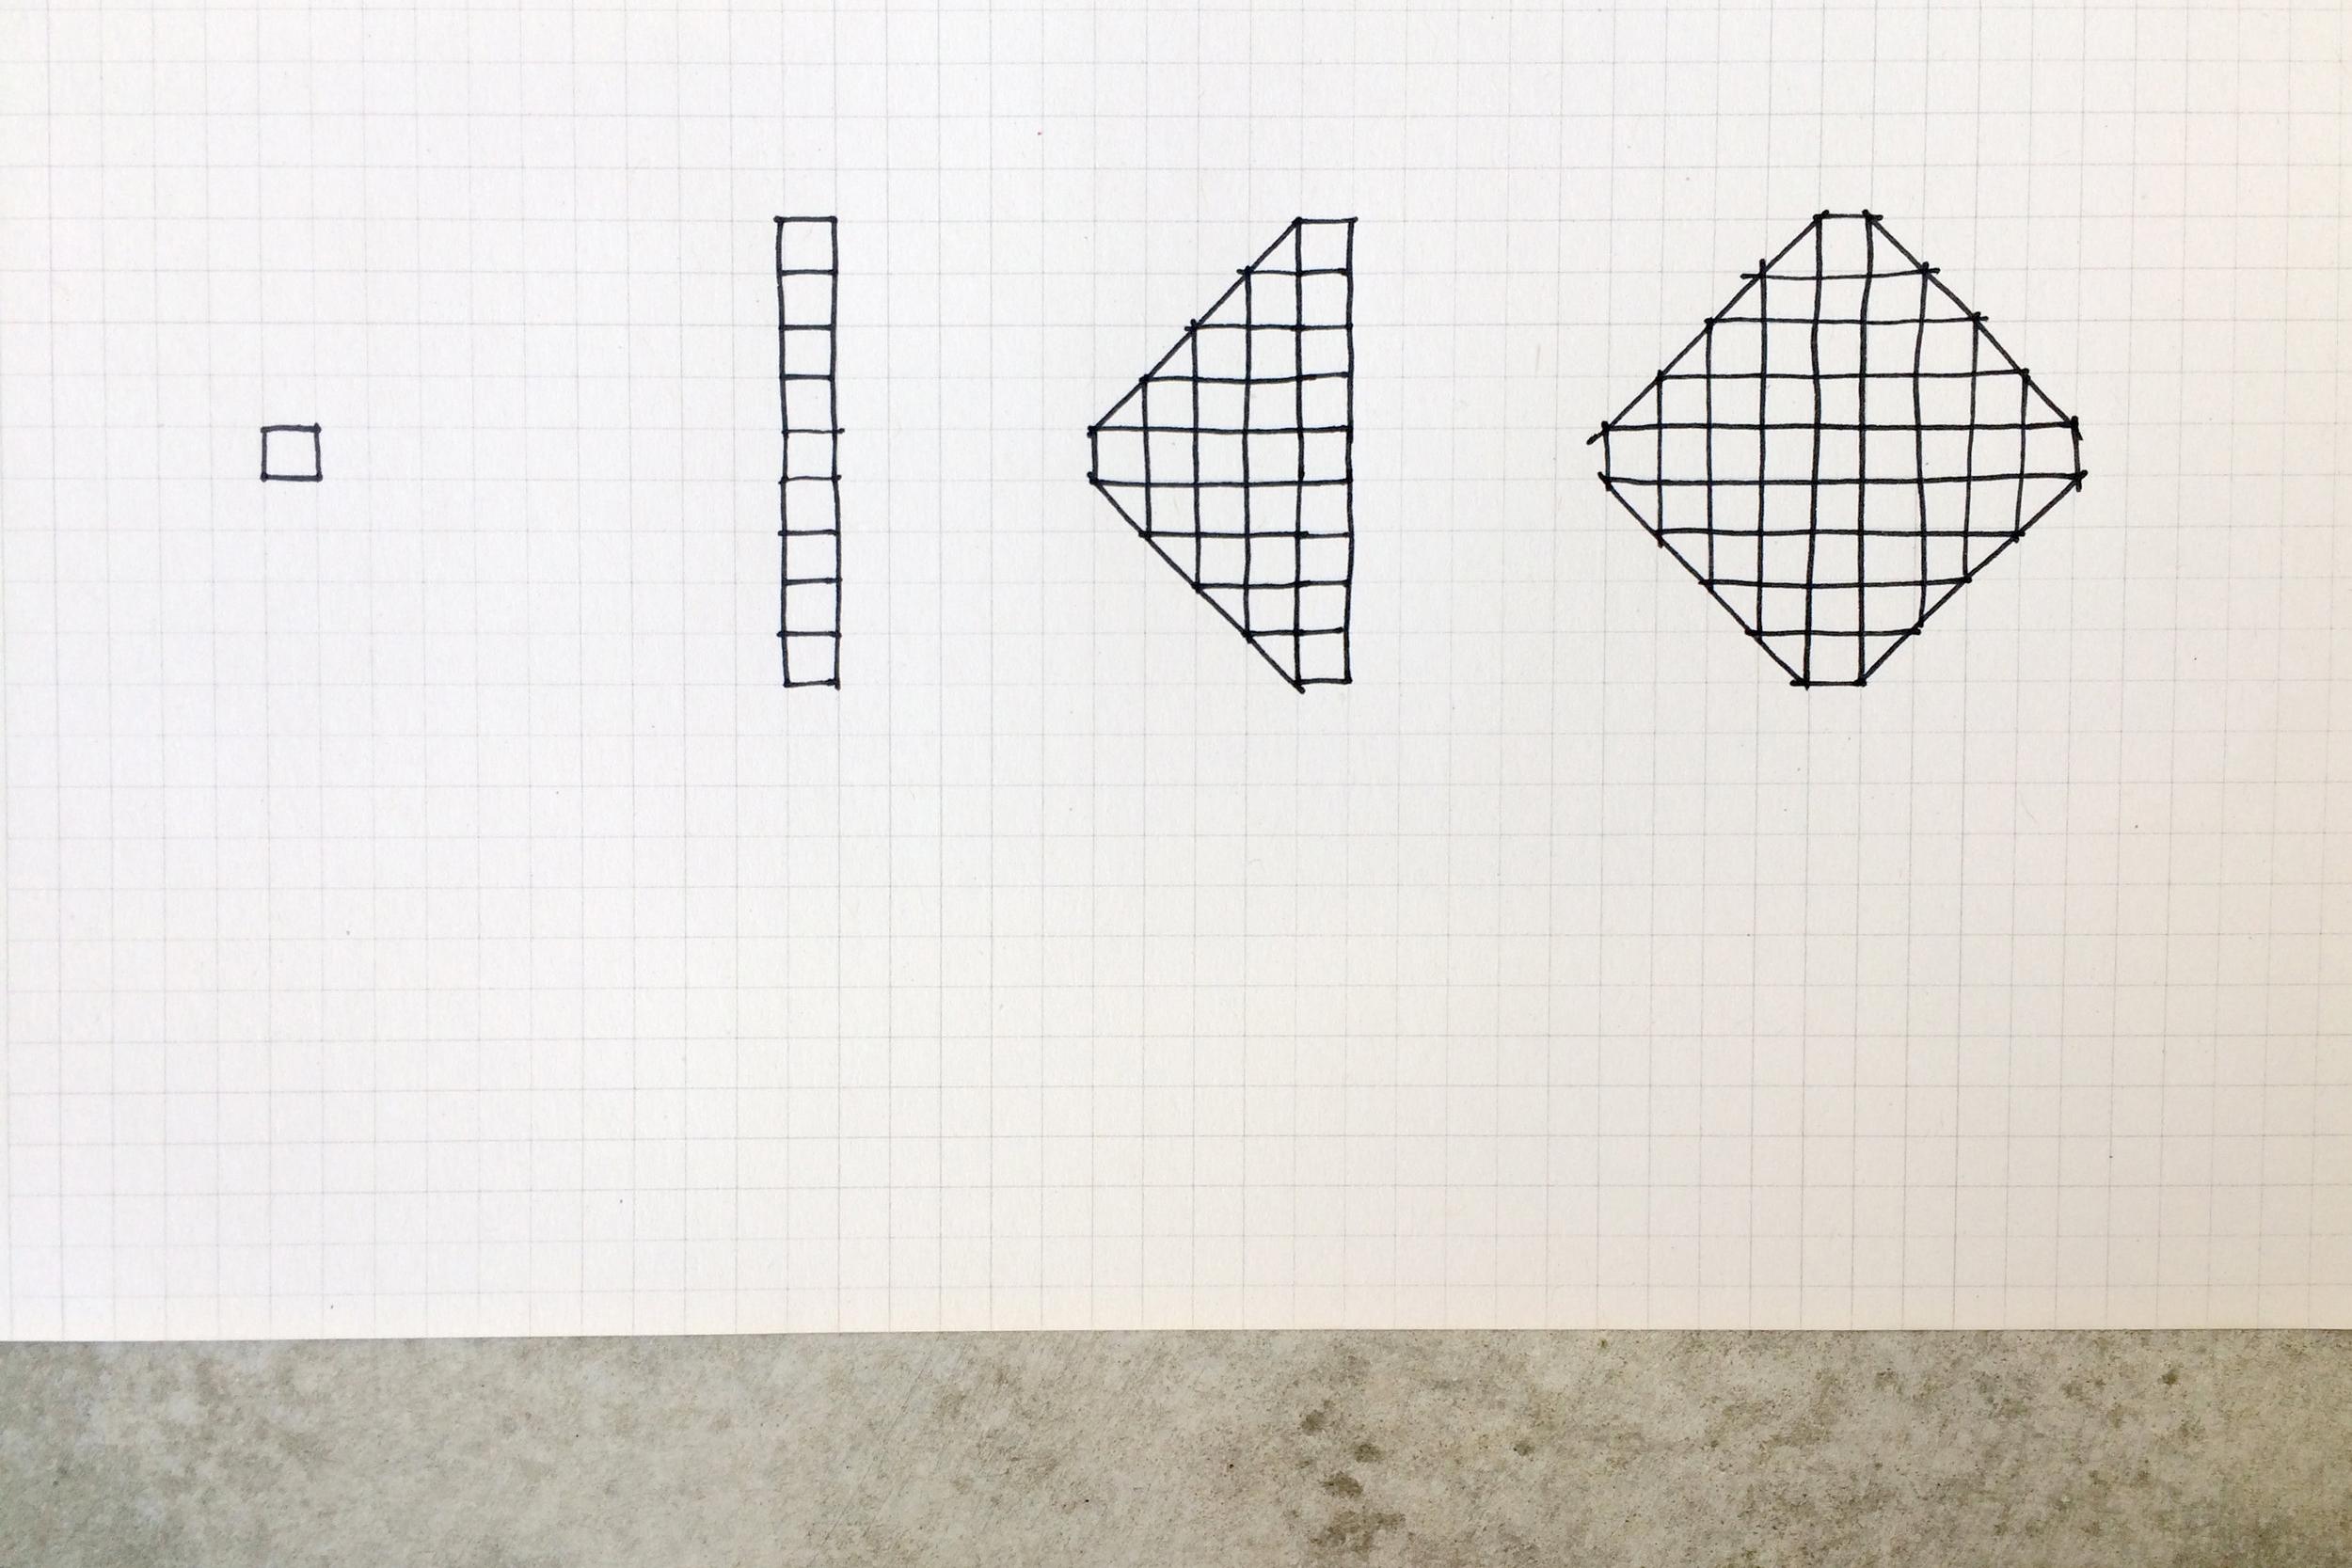 Pyramid-progress_10.JPG